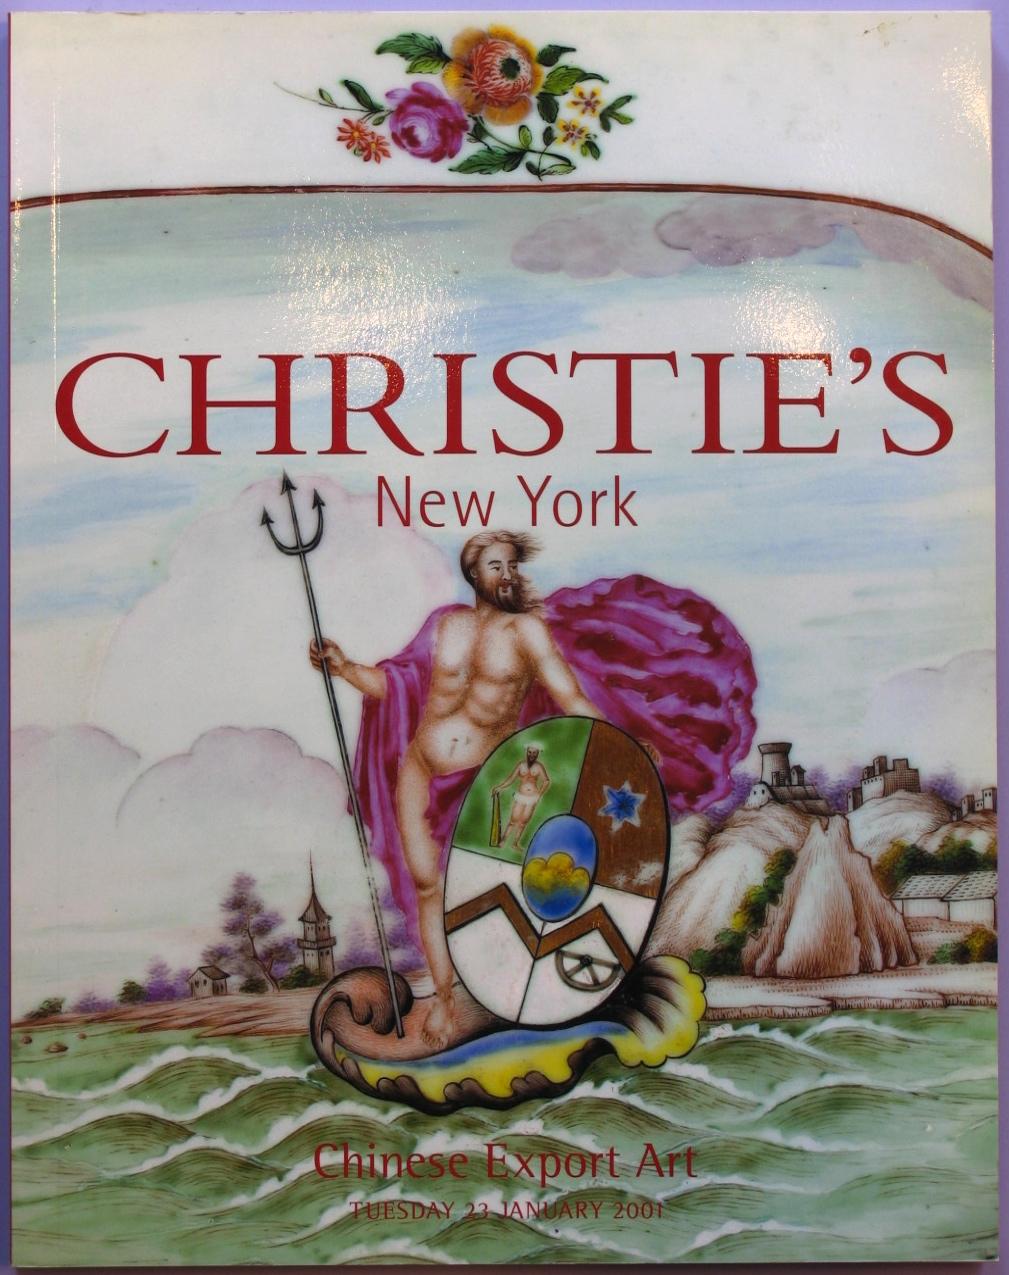 CNY20010123: Bookshop: [2001] Christie's Chinese Export Art